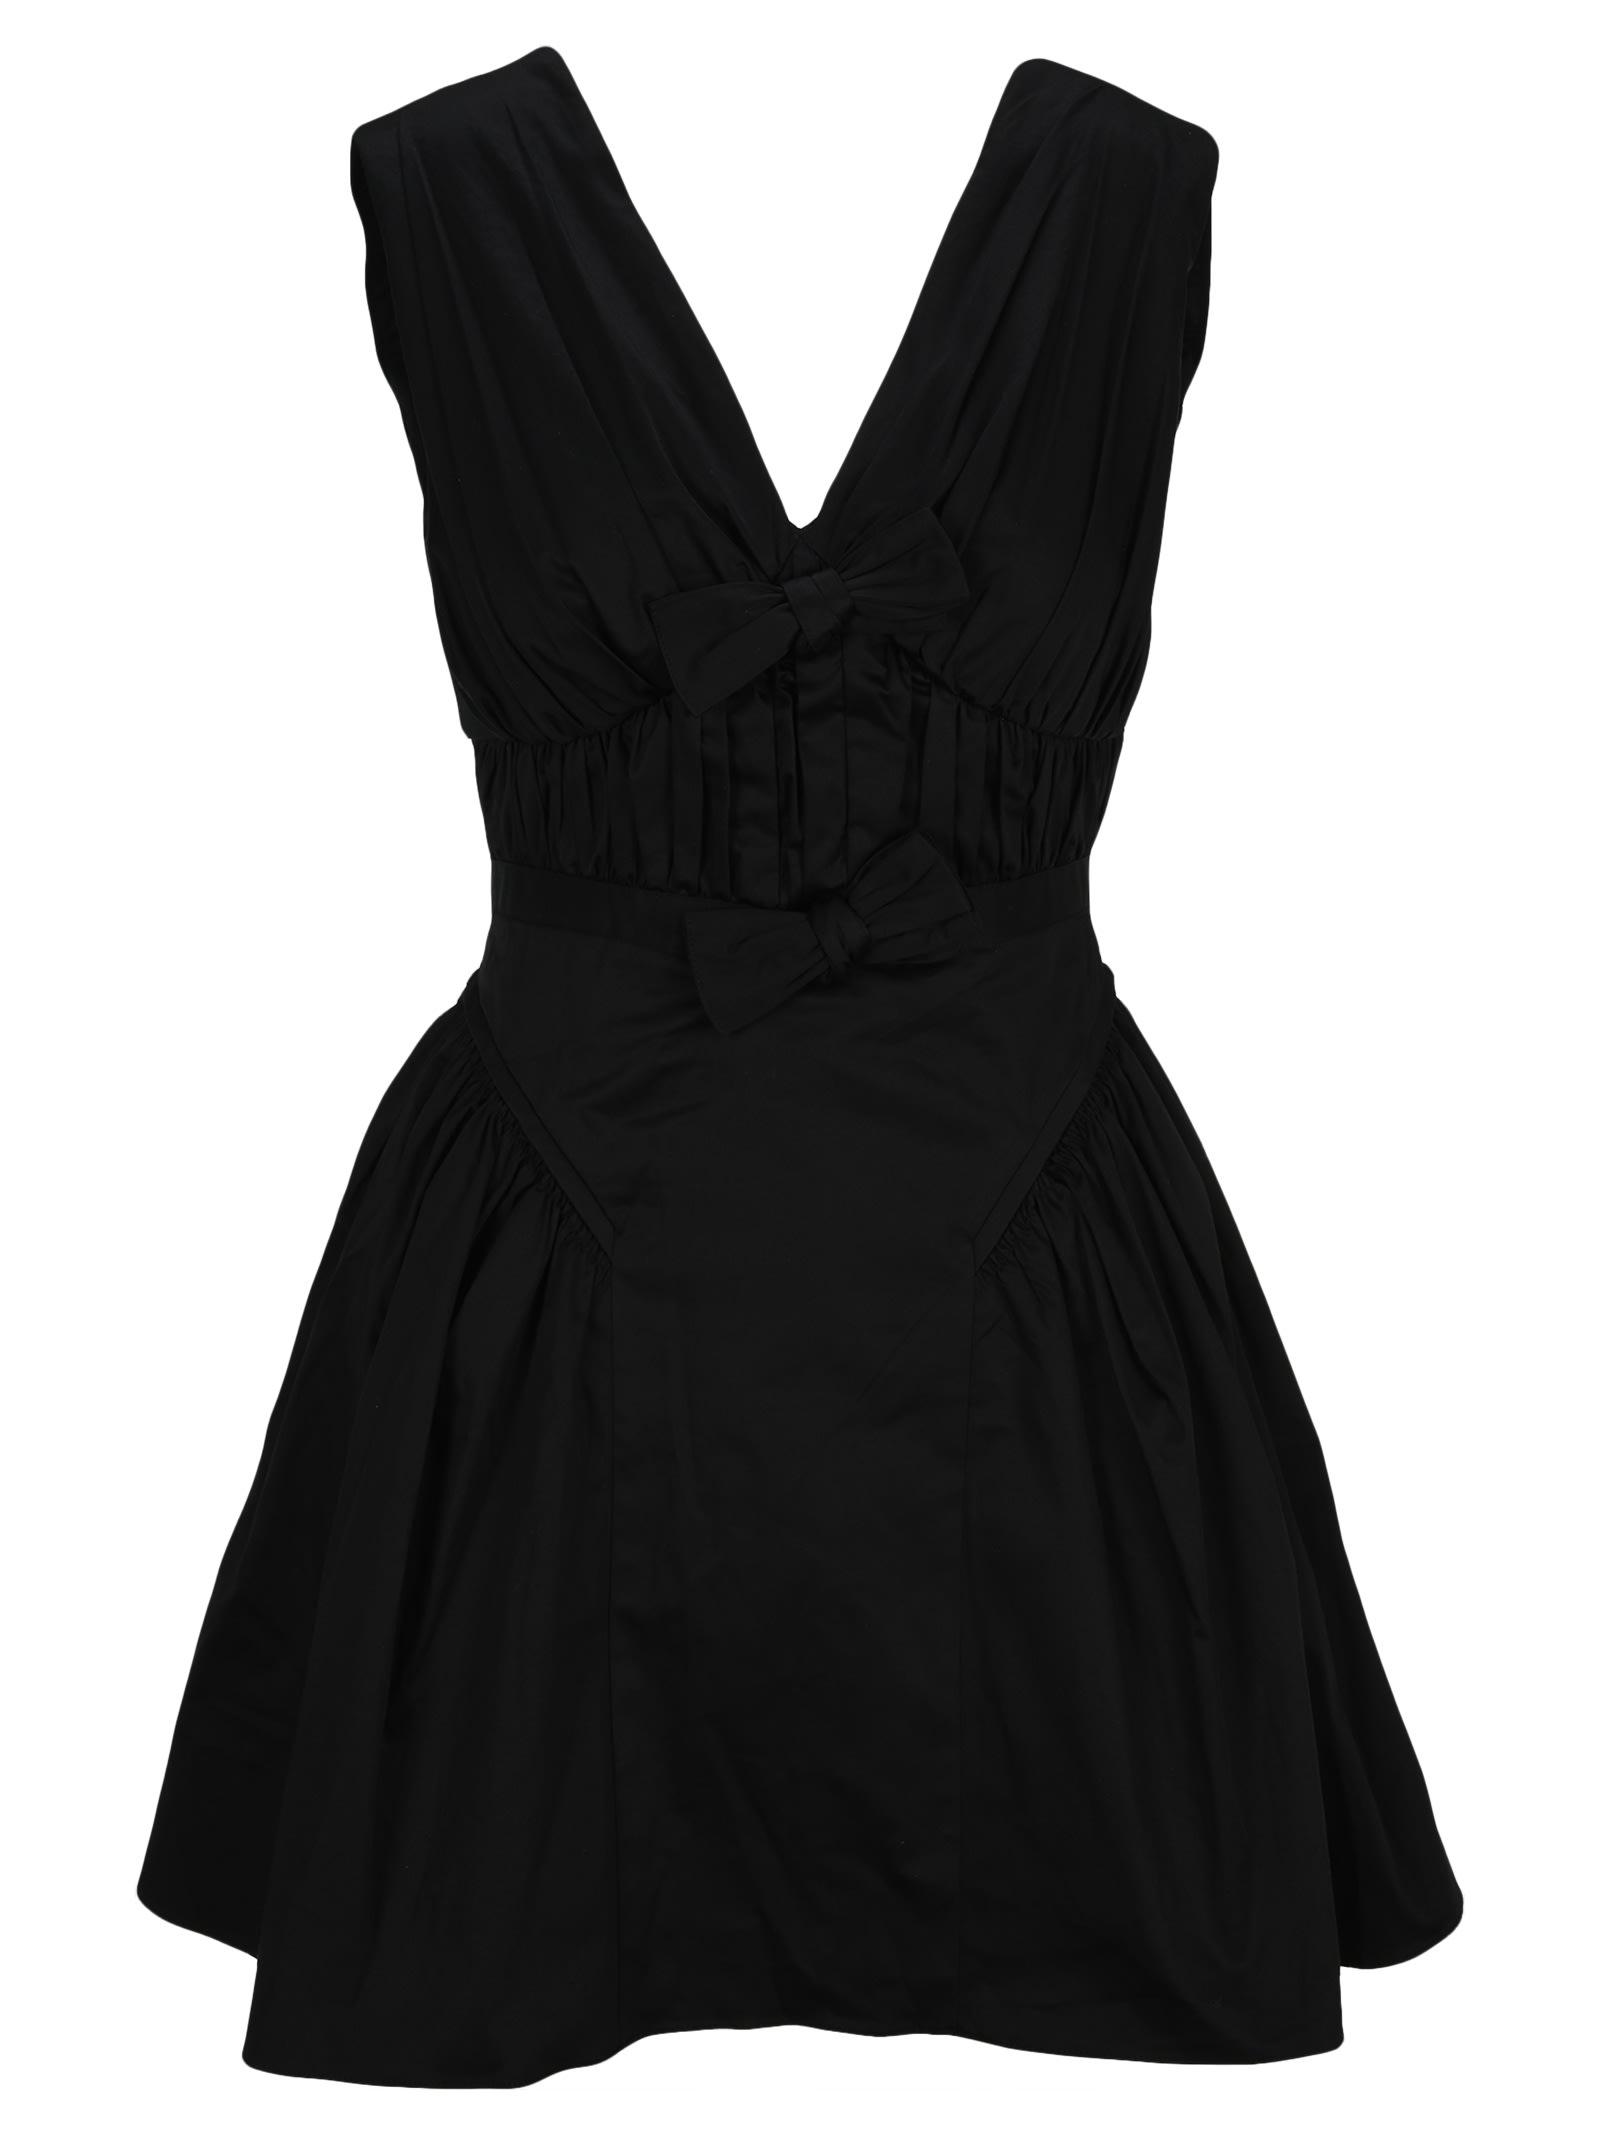 self-portrait Self Portrait Black Bow Detail Mini Dress